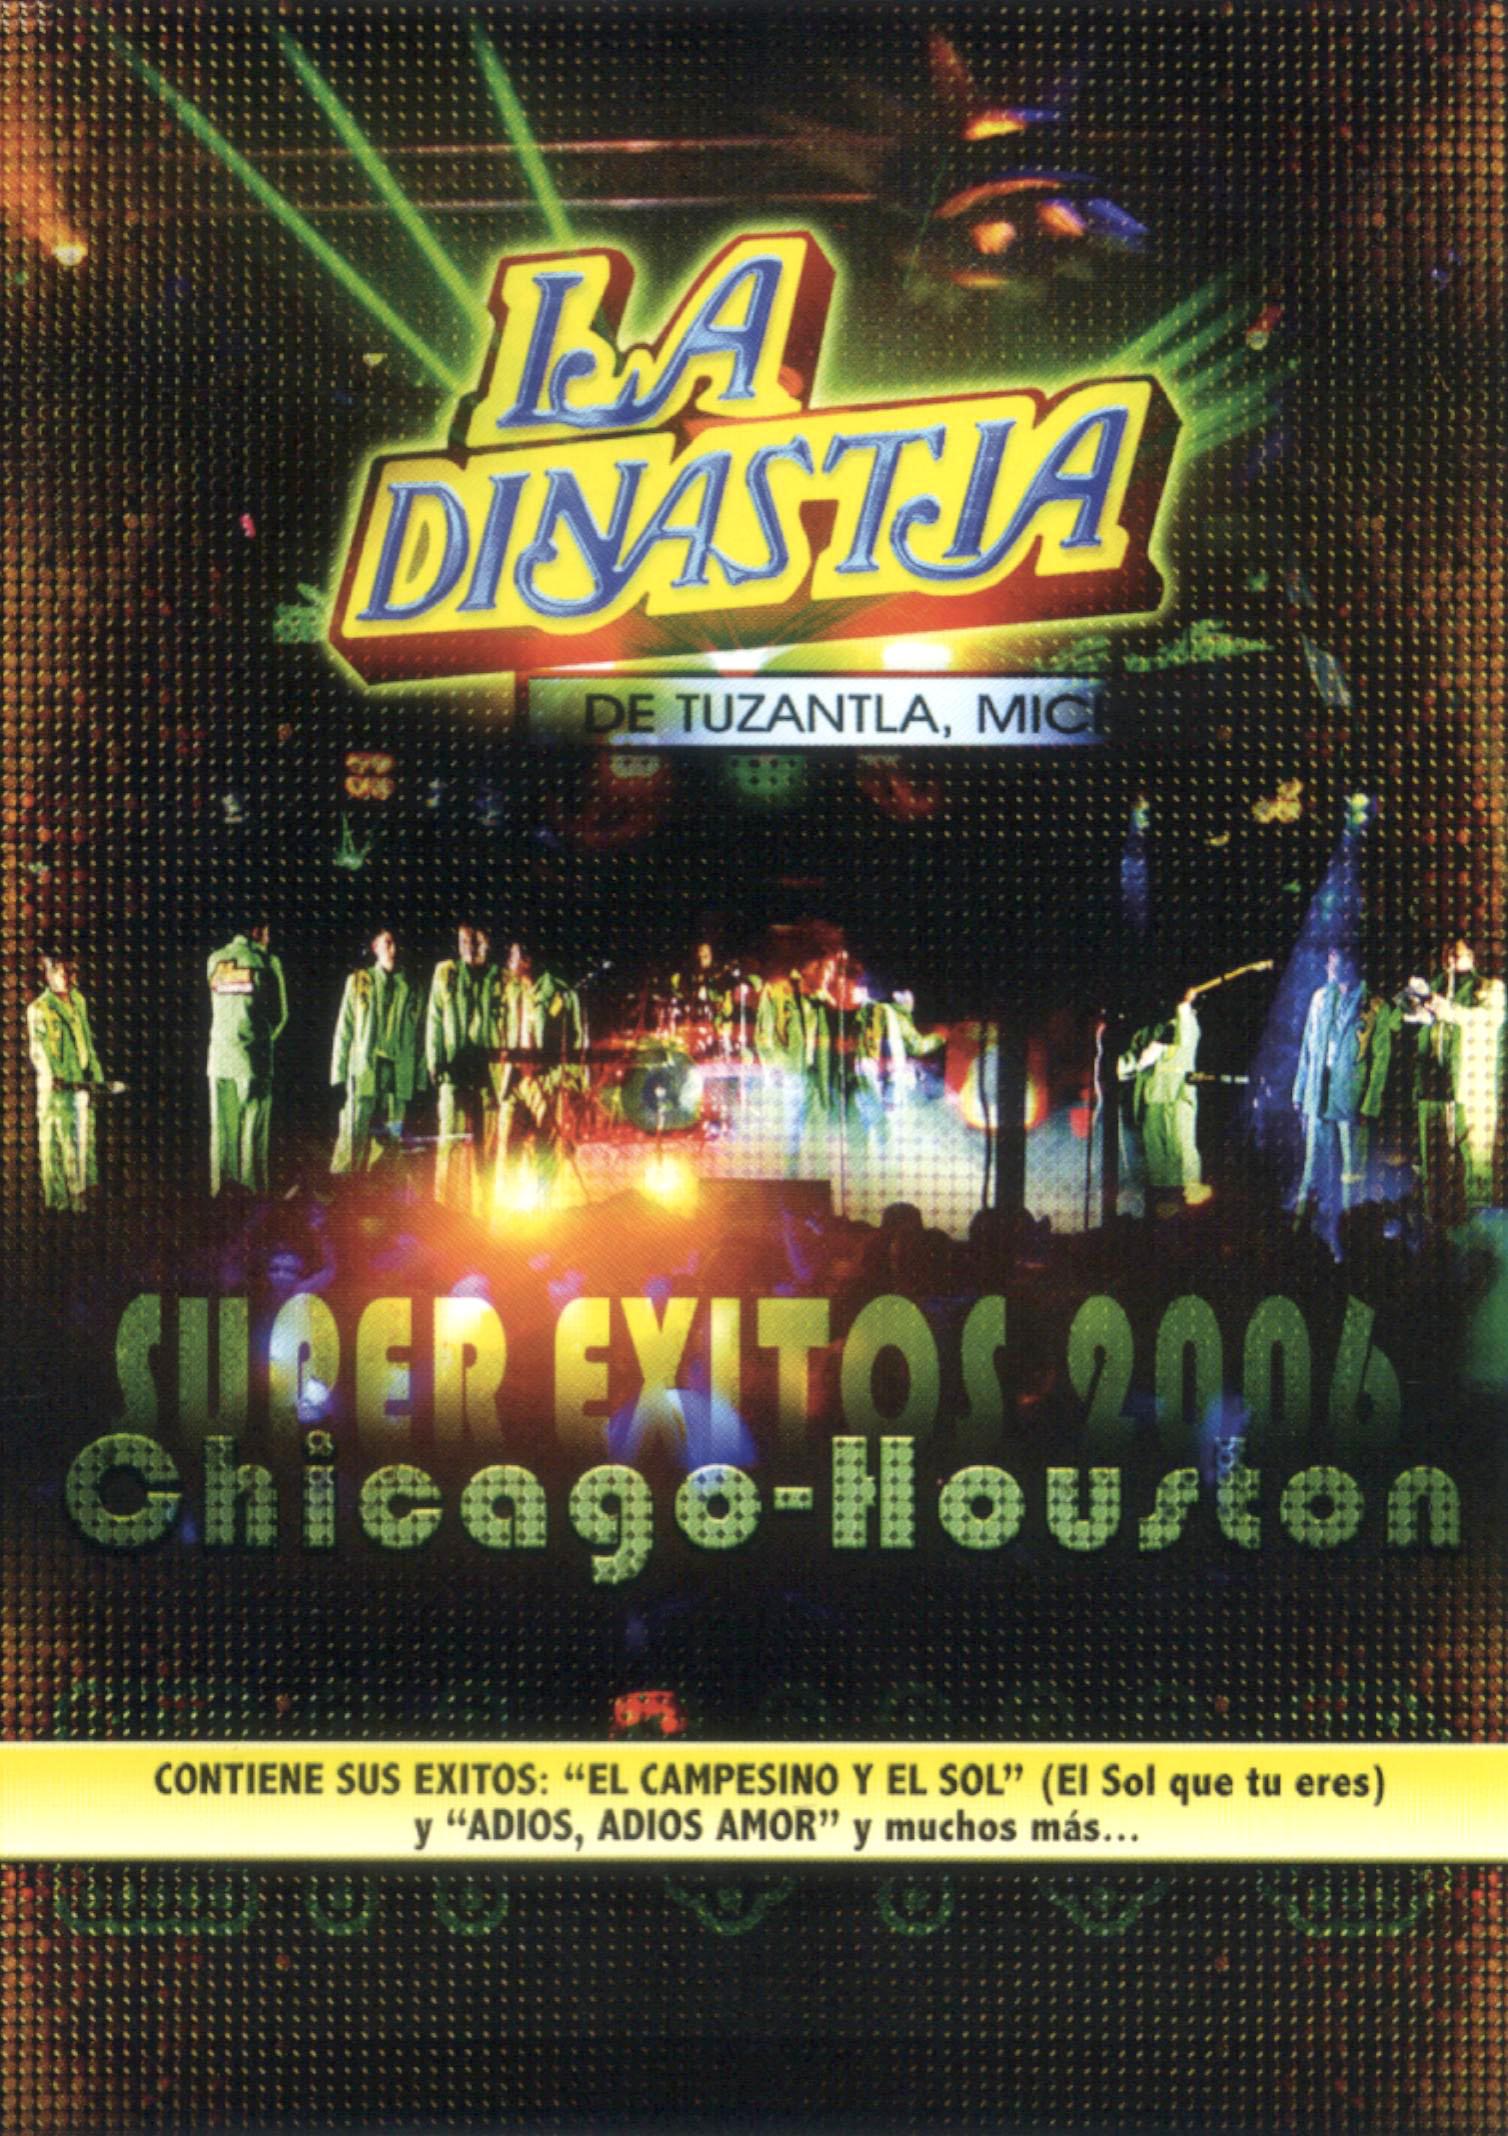 La Dinastia de Tuzantla: Super Exitos 2006 Chicago-Houston en Vivo